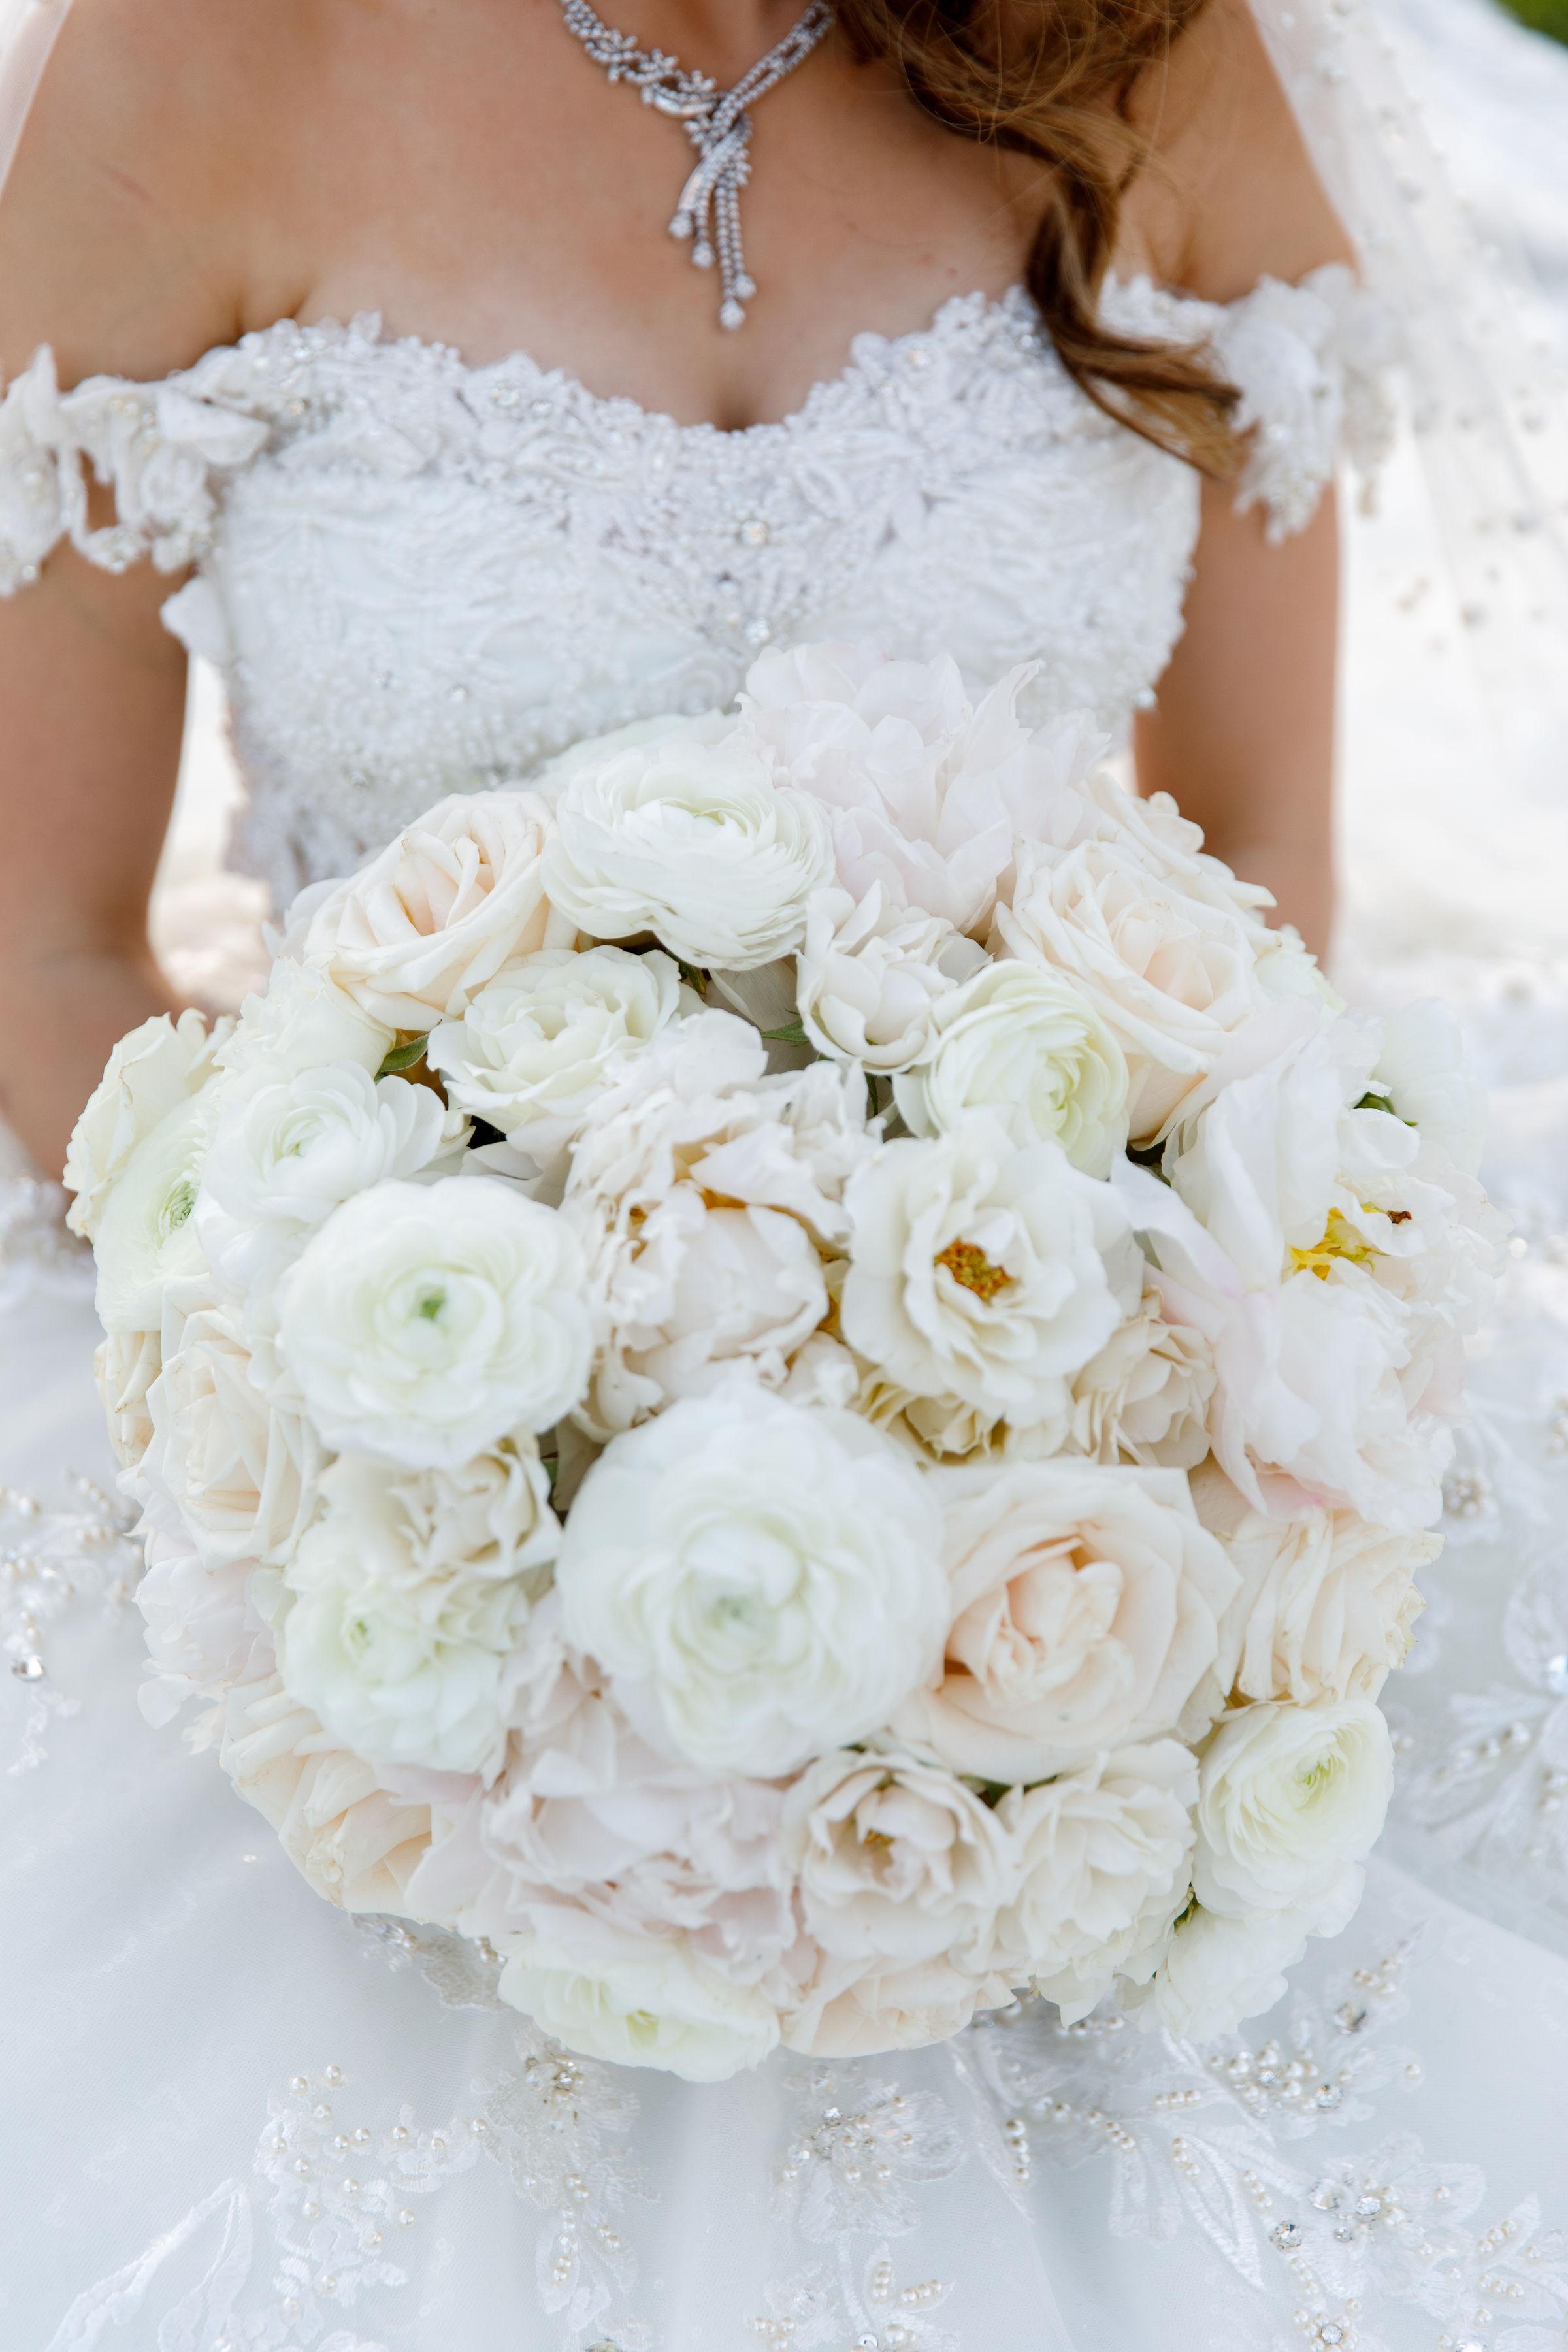 Wedding Photographer:  Kristen Weaver  | Wedding Coordinator:  The Soiree Co Weddings  | Wedding Location: Four Seasons Resort Orlando